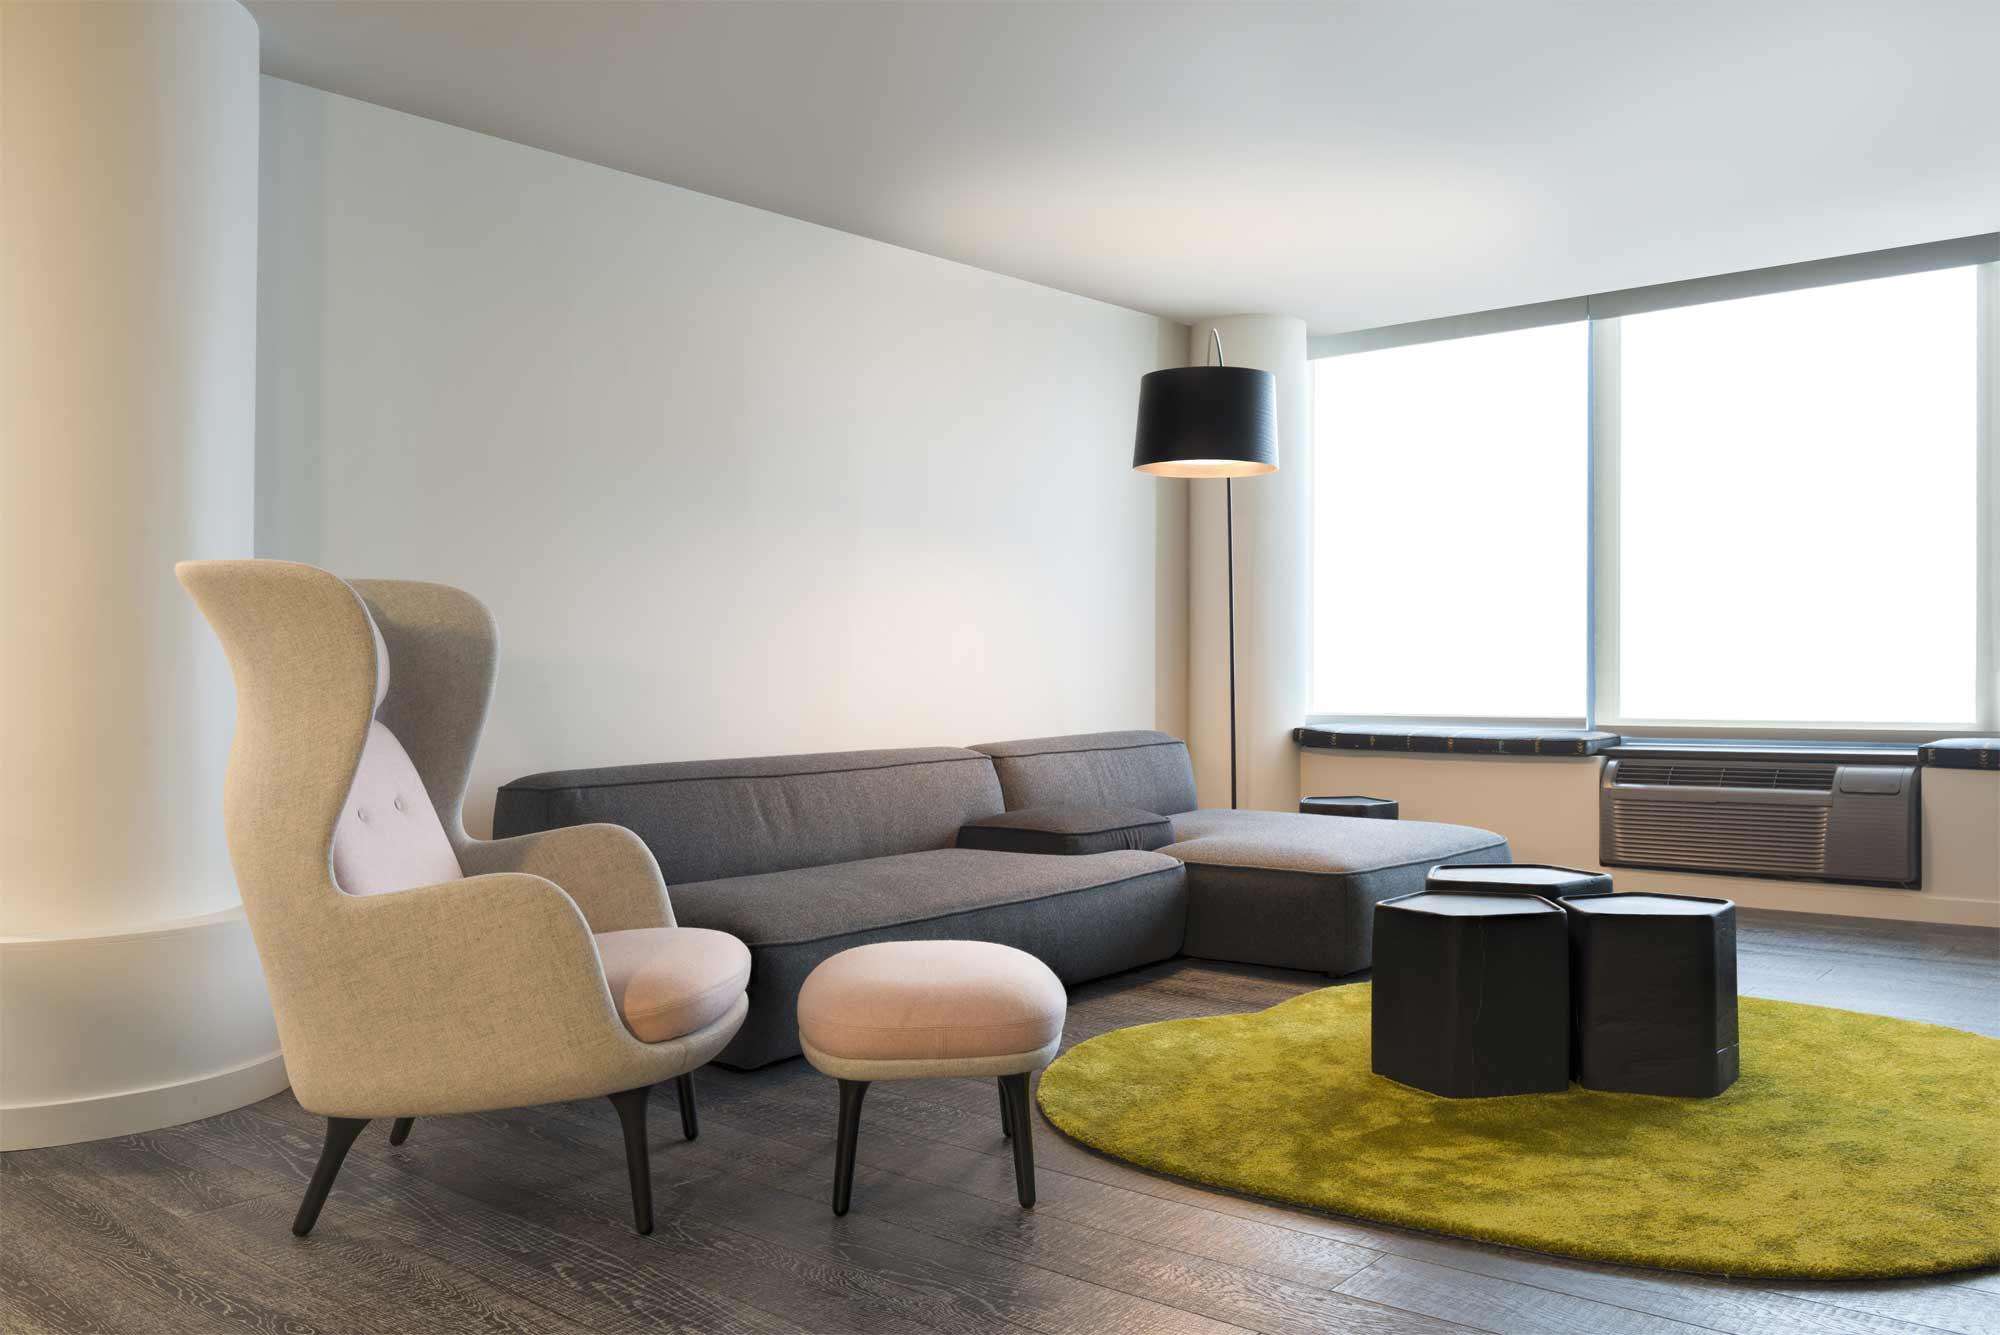 foscarini twiggy stehlampe halogena carmes 159003 67. Black Bedroom Furniture Sets. Home Design Ideas